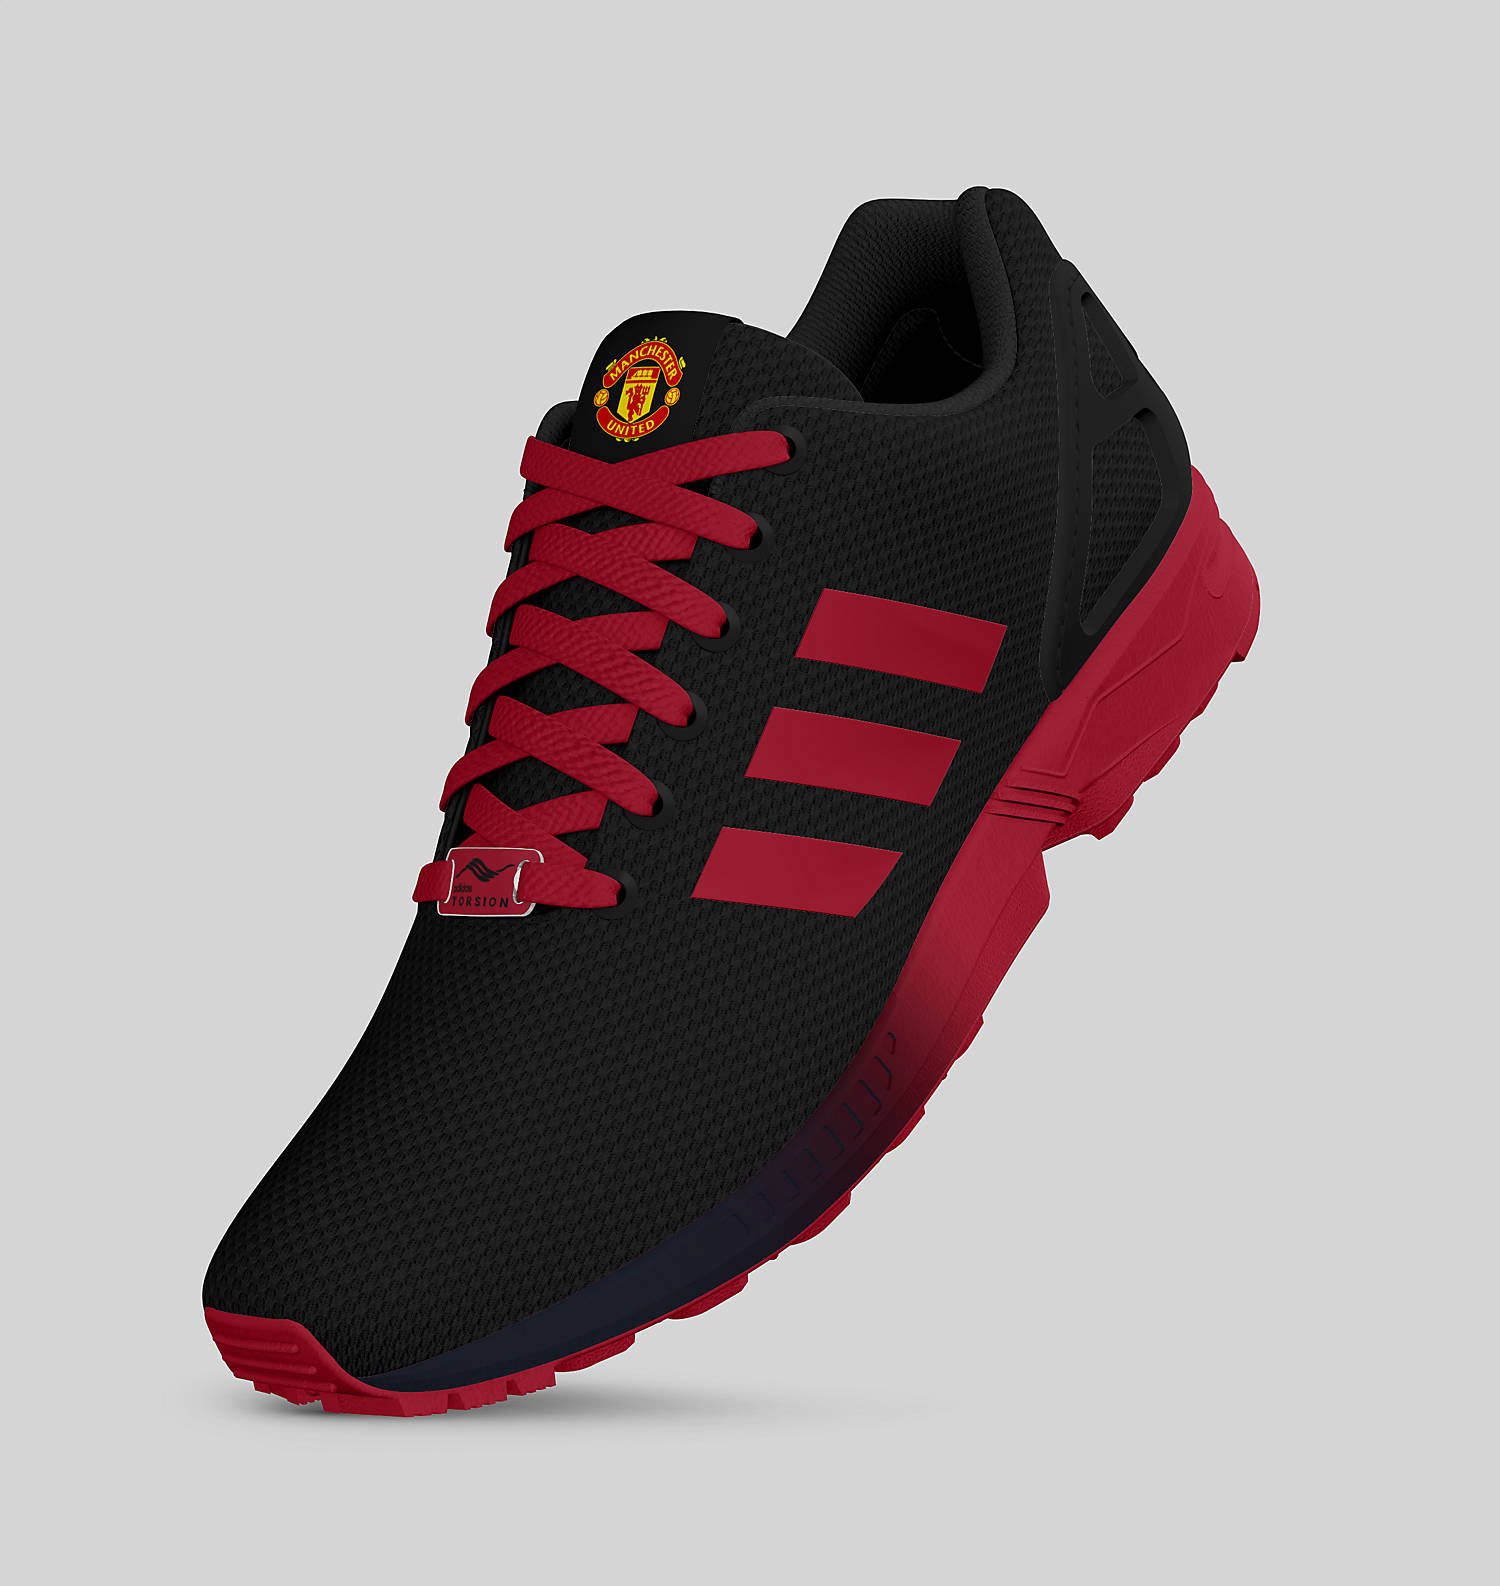 ... hot zx flux mi adidas adidas manchester united zx flux sneakers 27089  b79b2 83800c2f5